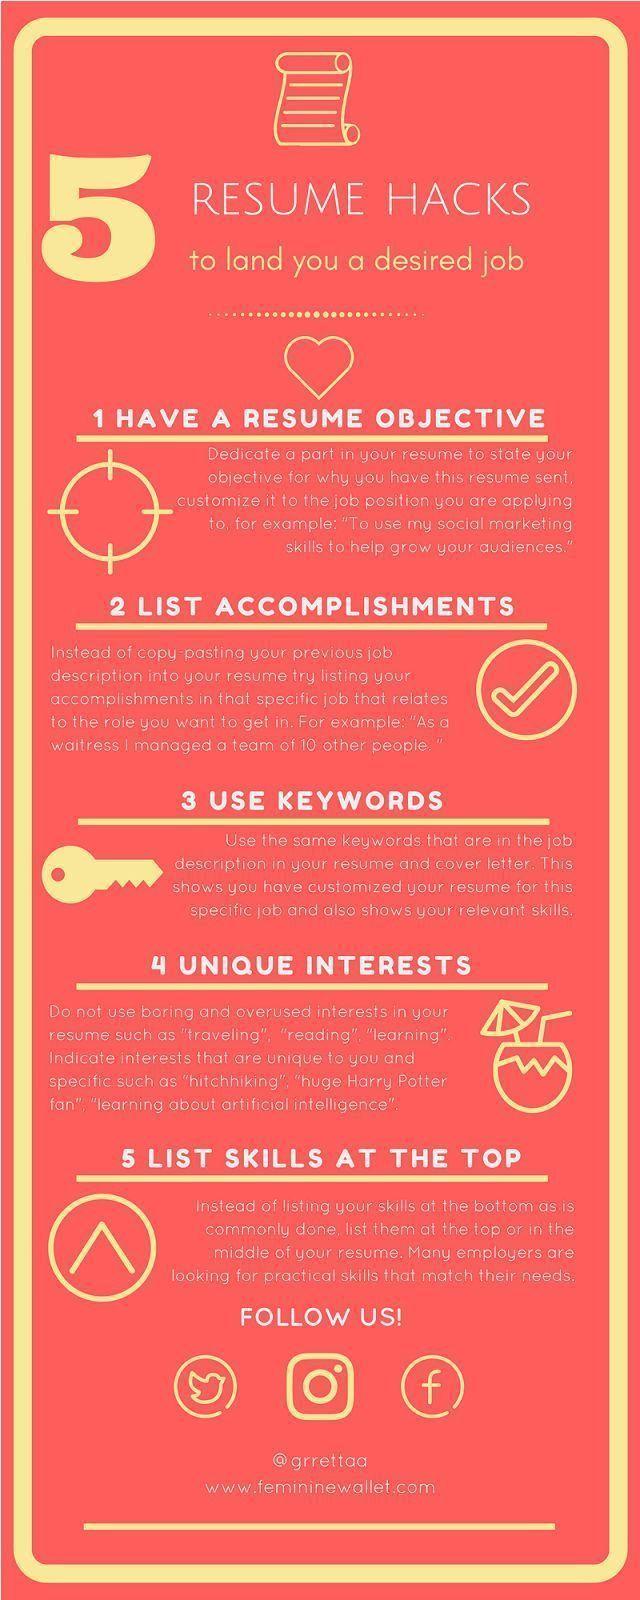 Resume Tips To Nail That Job Interview Cv Tips Resume Skills